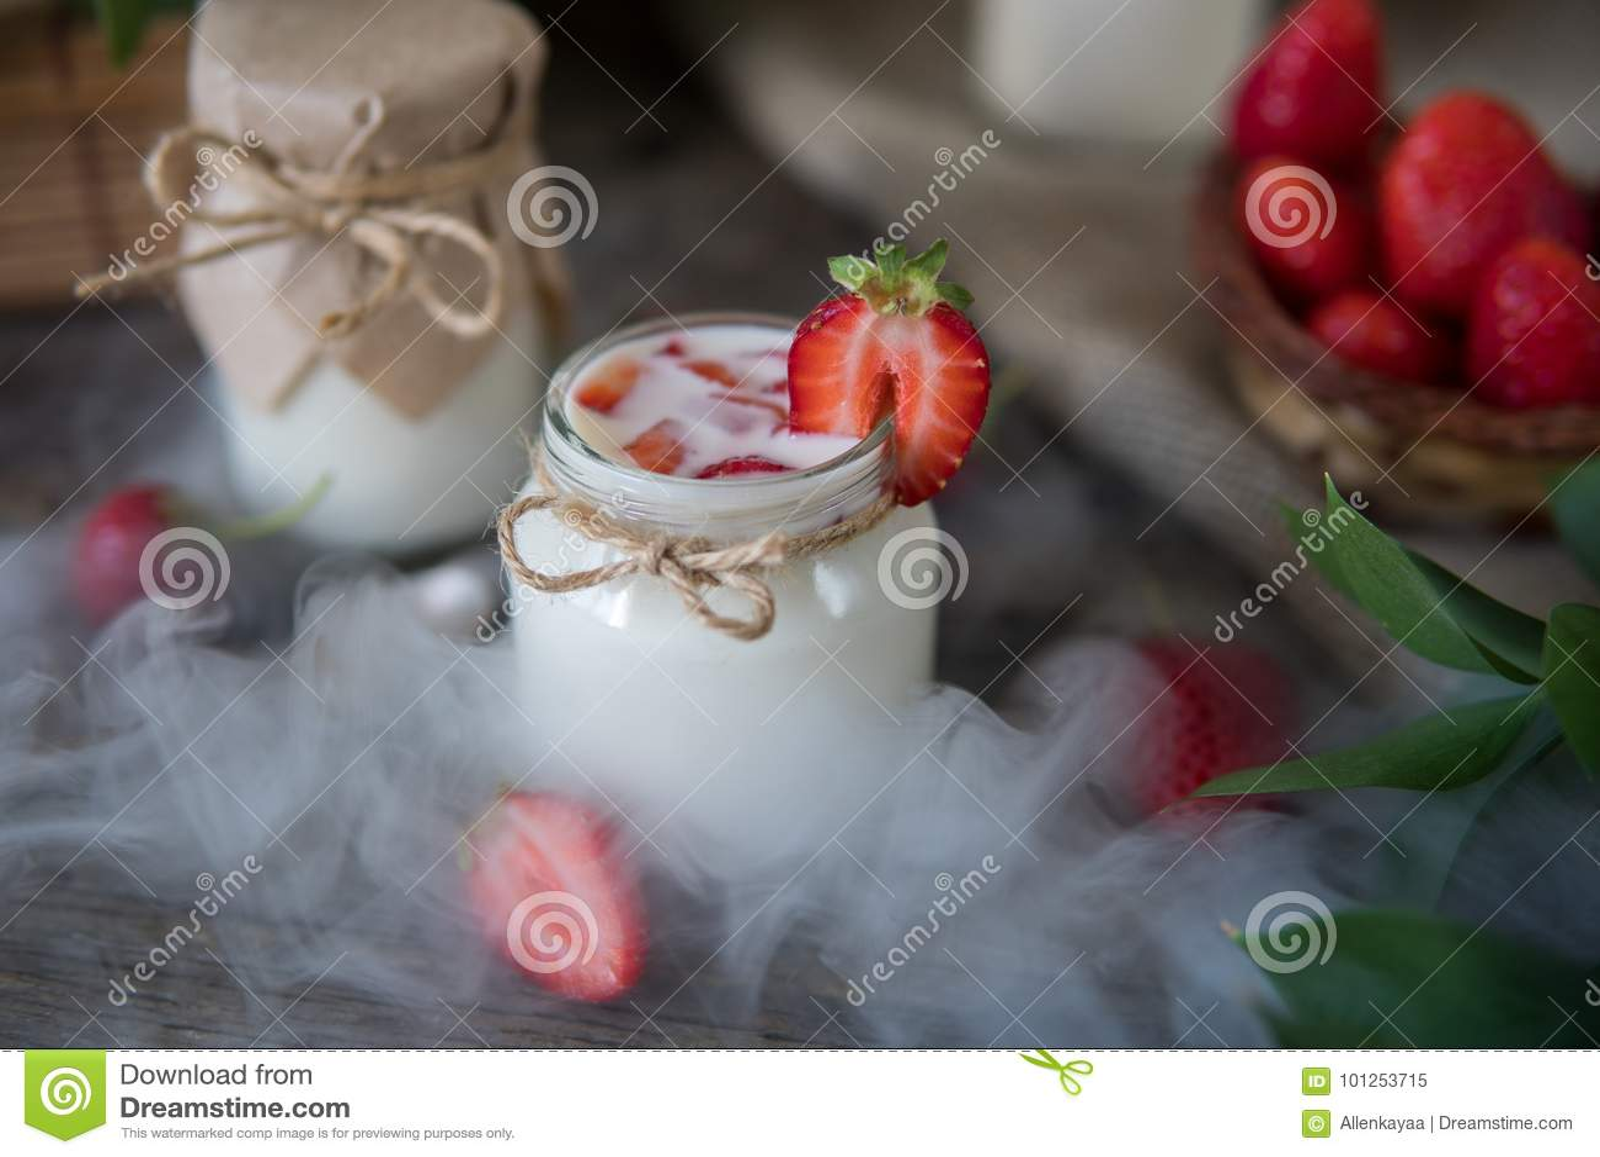 Organic yougurt in jar with strawberry. Fresh strawberry with yo